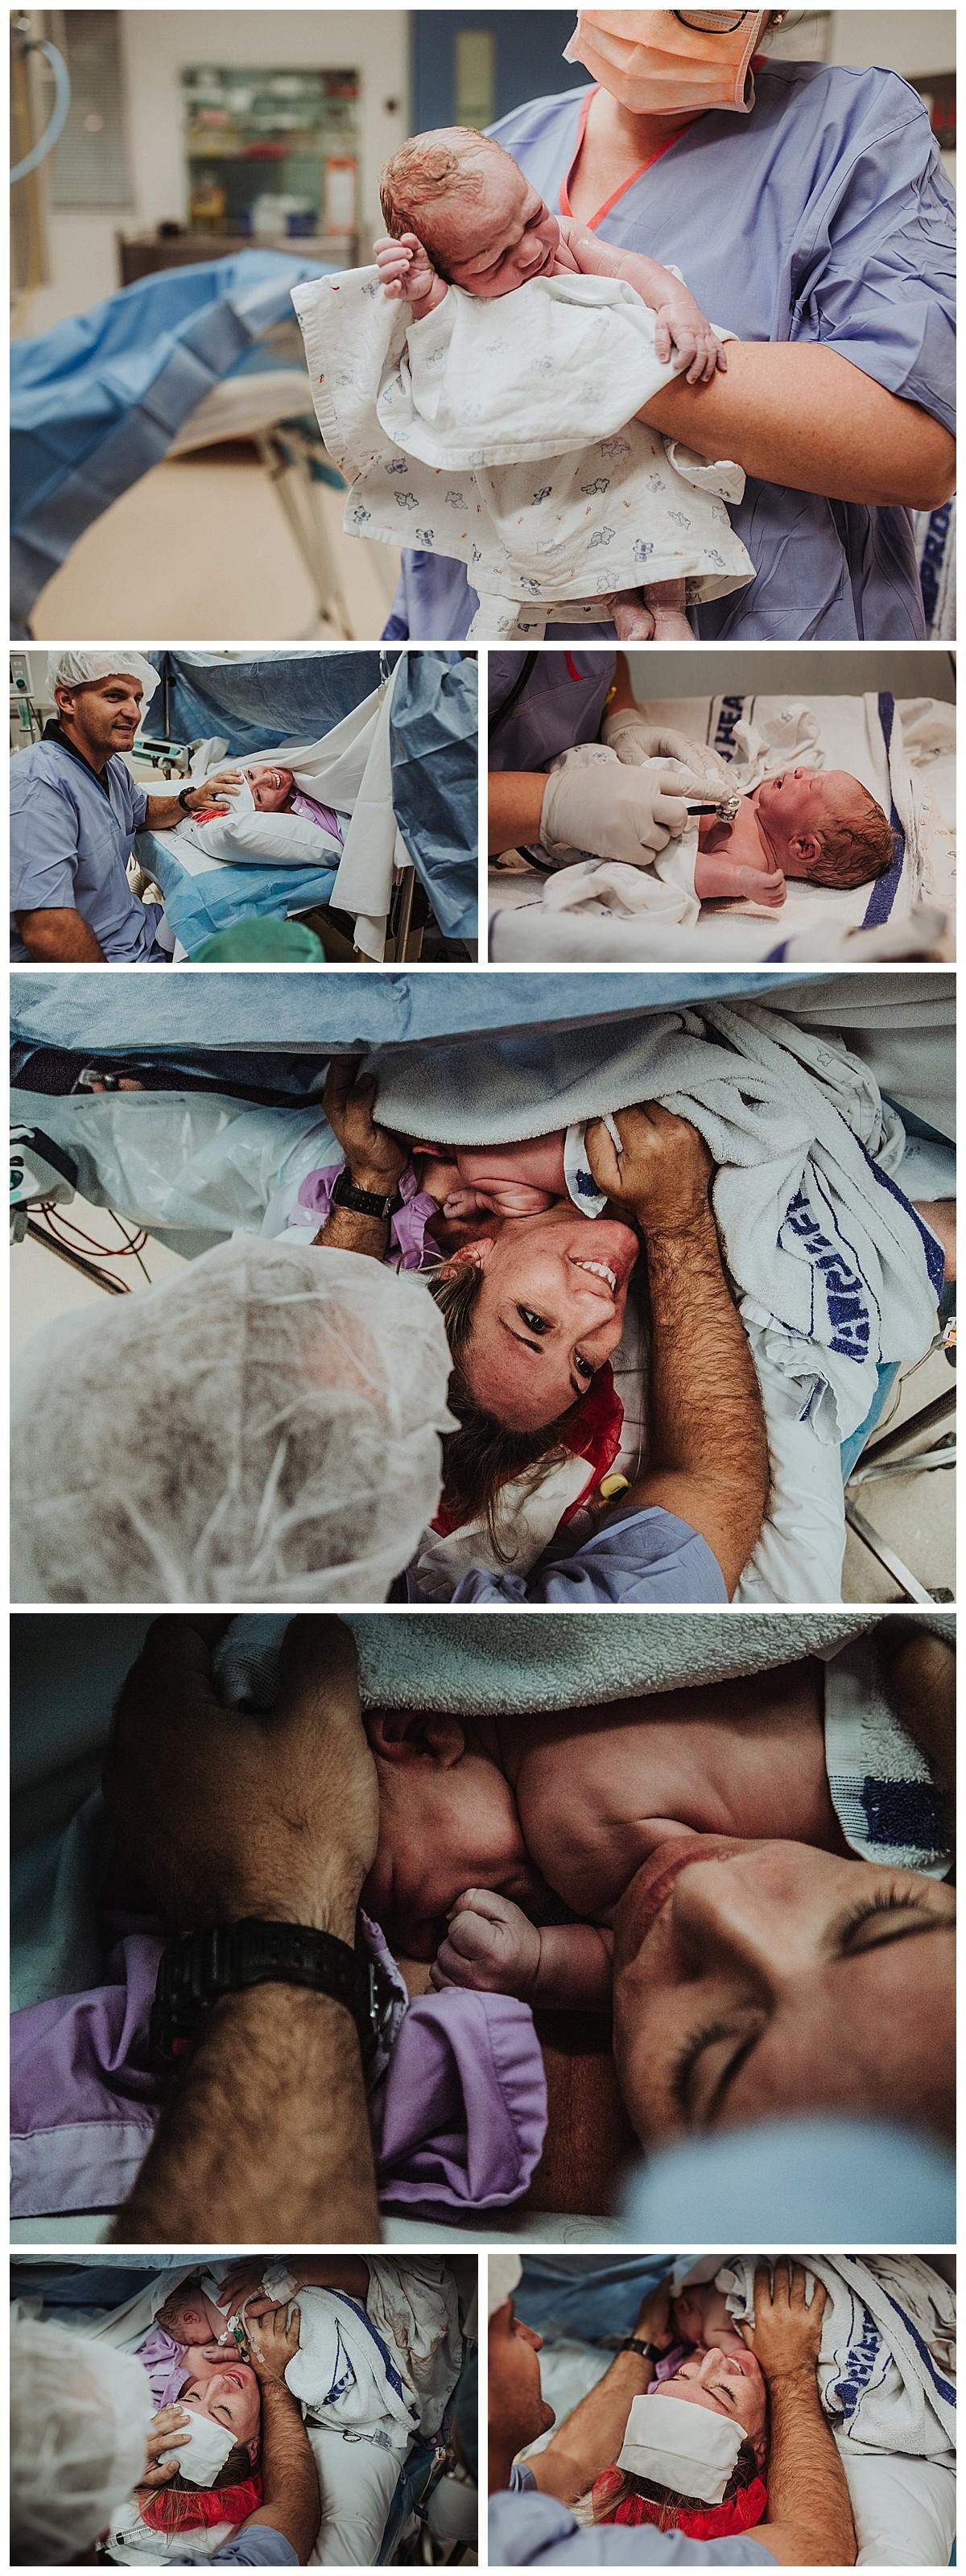 Brand-New-Baby-OR-Operating-Theatre-newborn-check-parents-Photographer.jpg